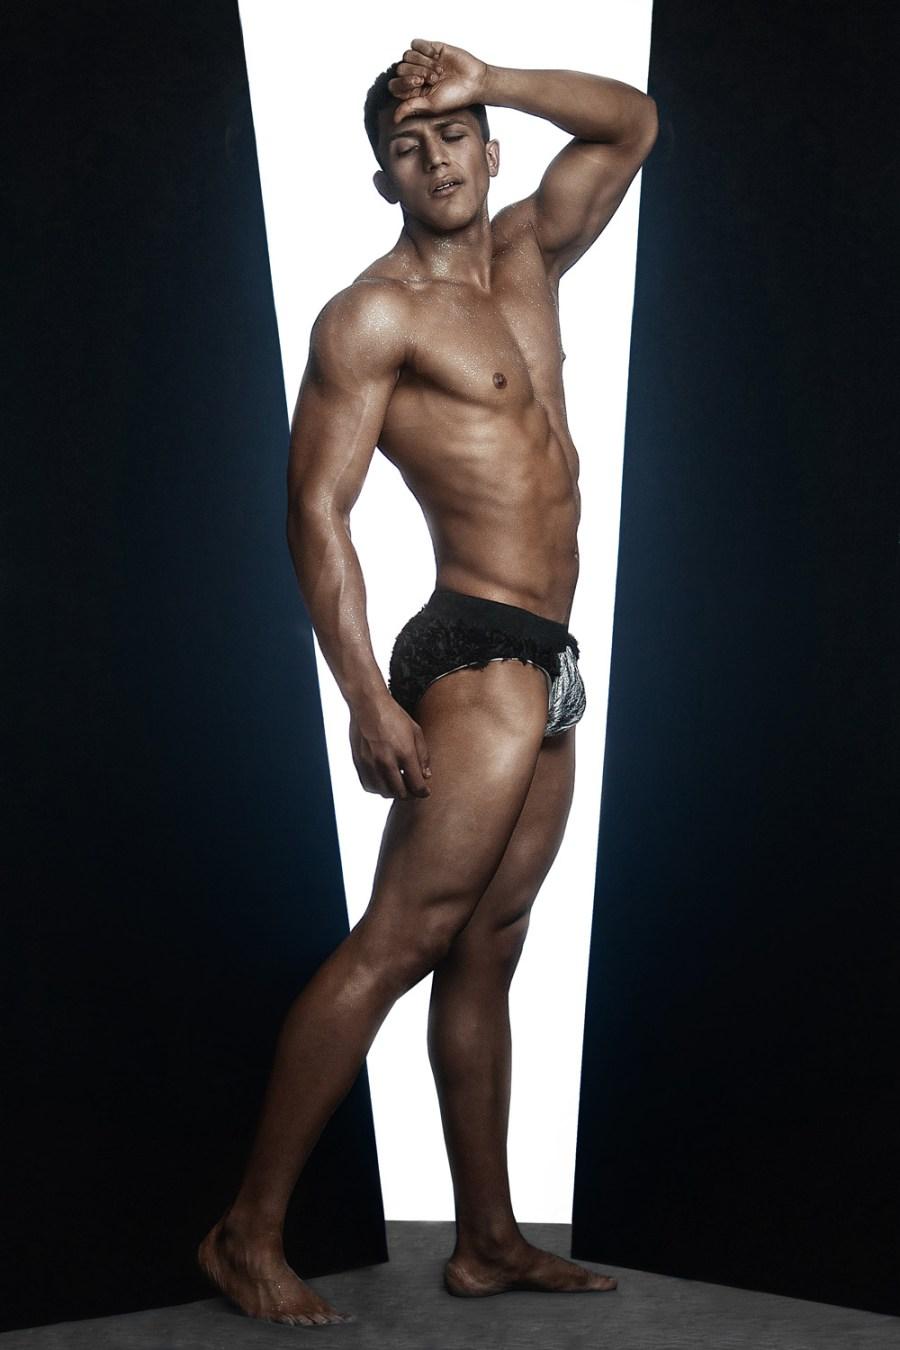 Erik Ramos by Chris Femat for Fashionably Male420